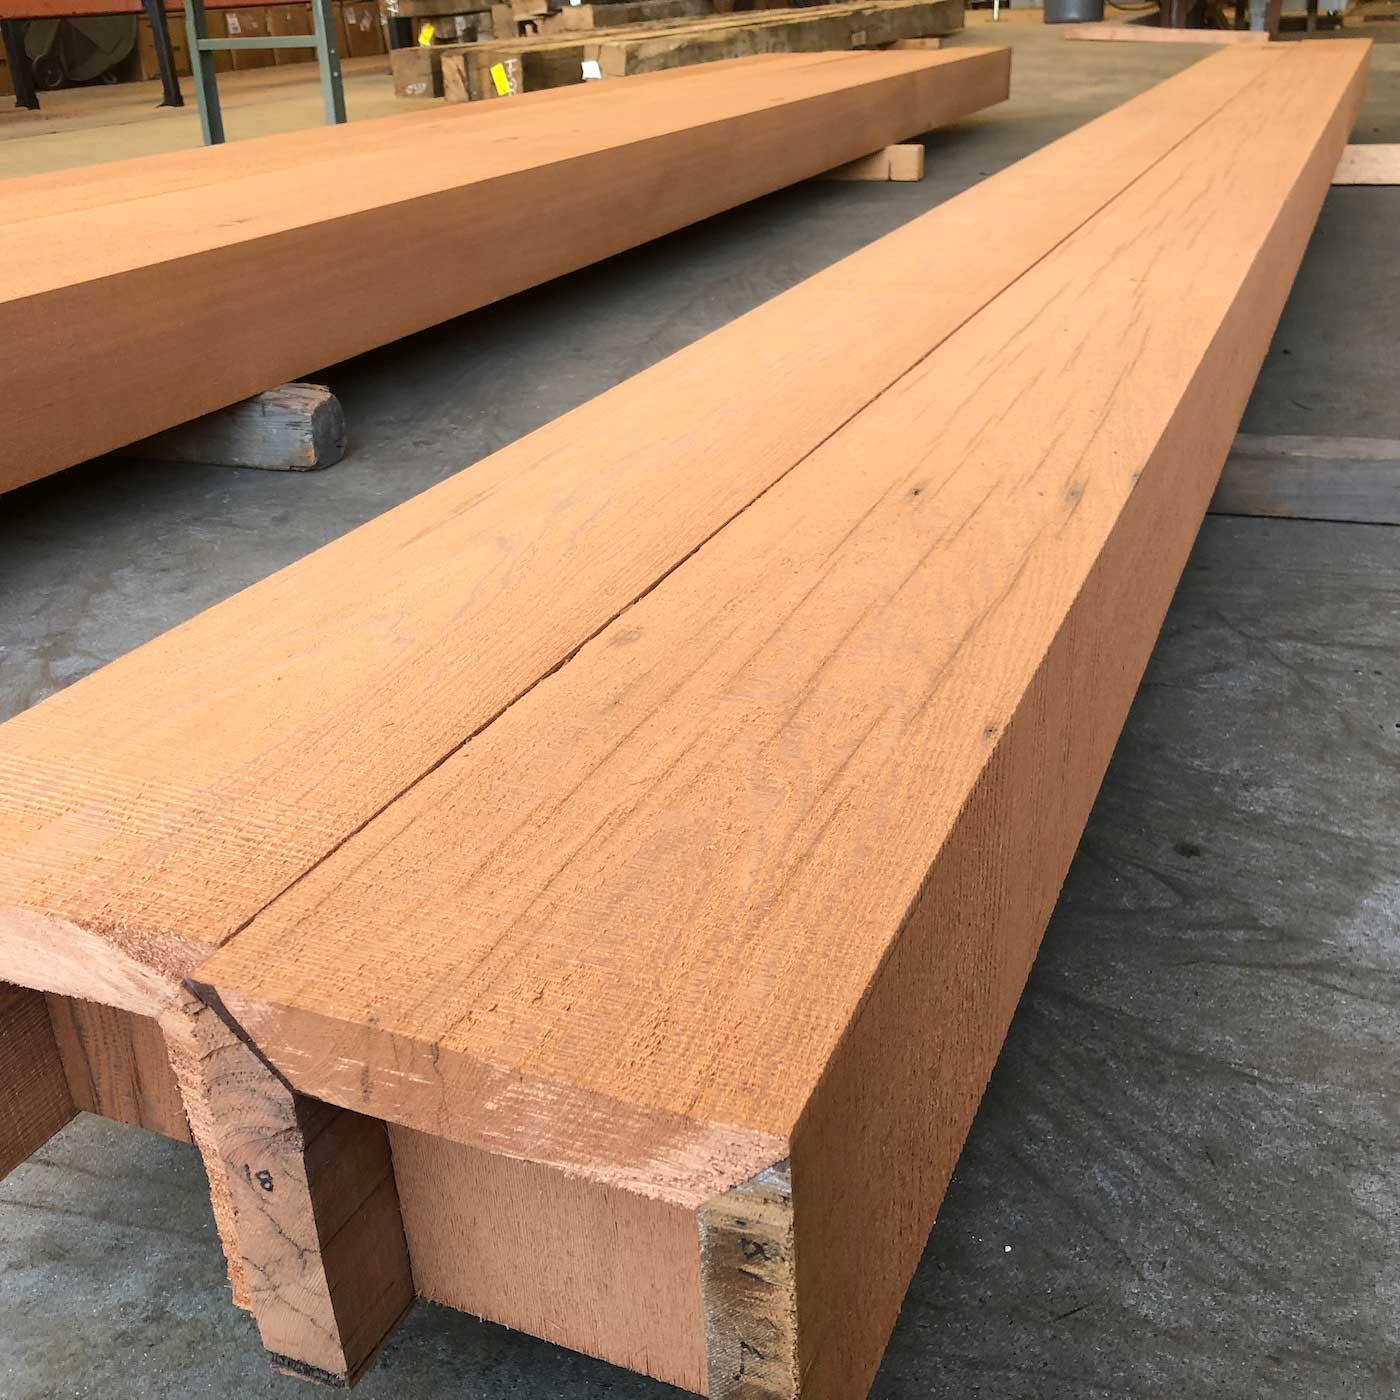 resawn redwood box beams - Box Beam Fabrication